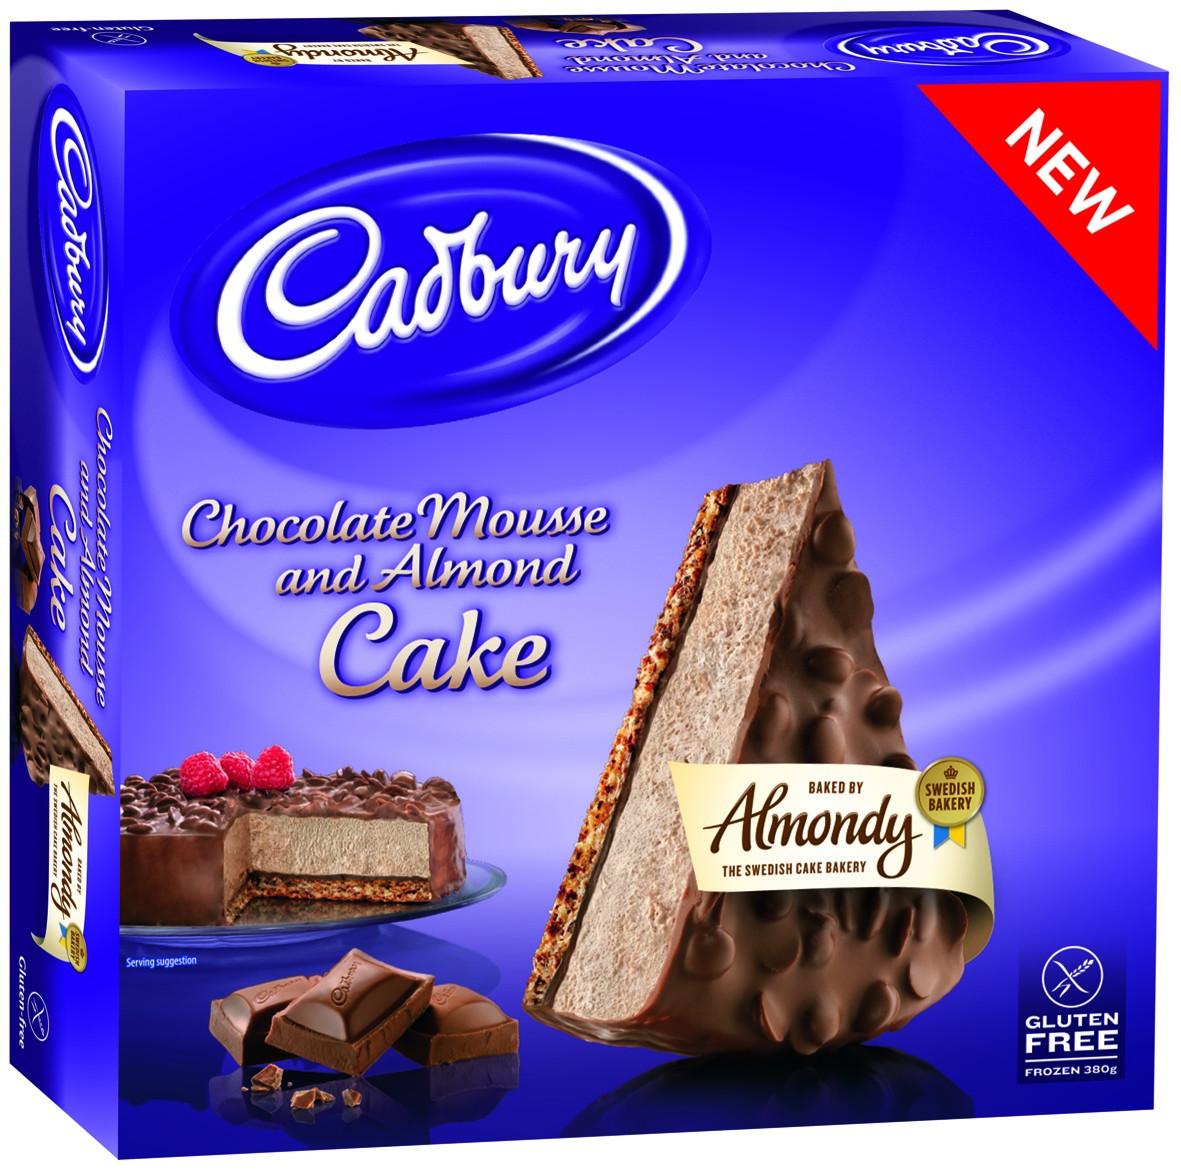 Frozen Dessert Brand  Almondy partners with Cadbury and Philadelphia for branded